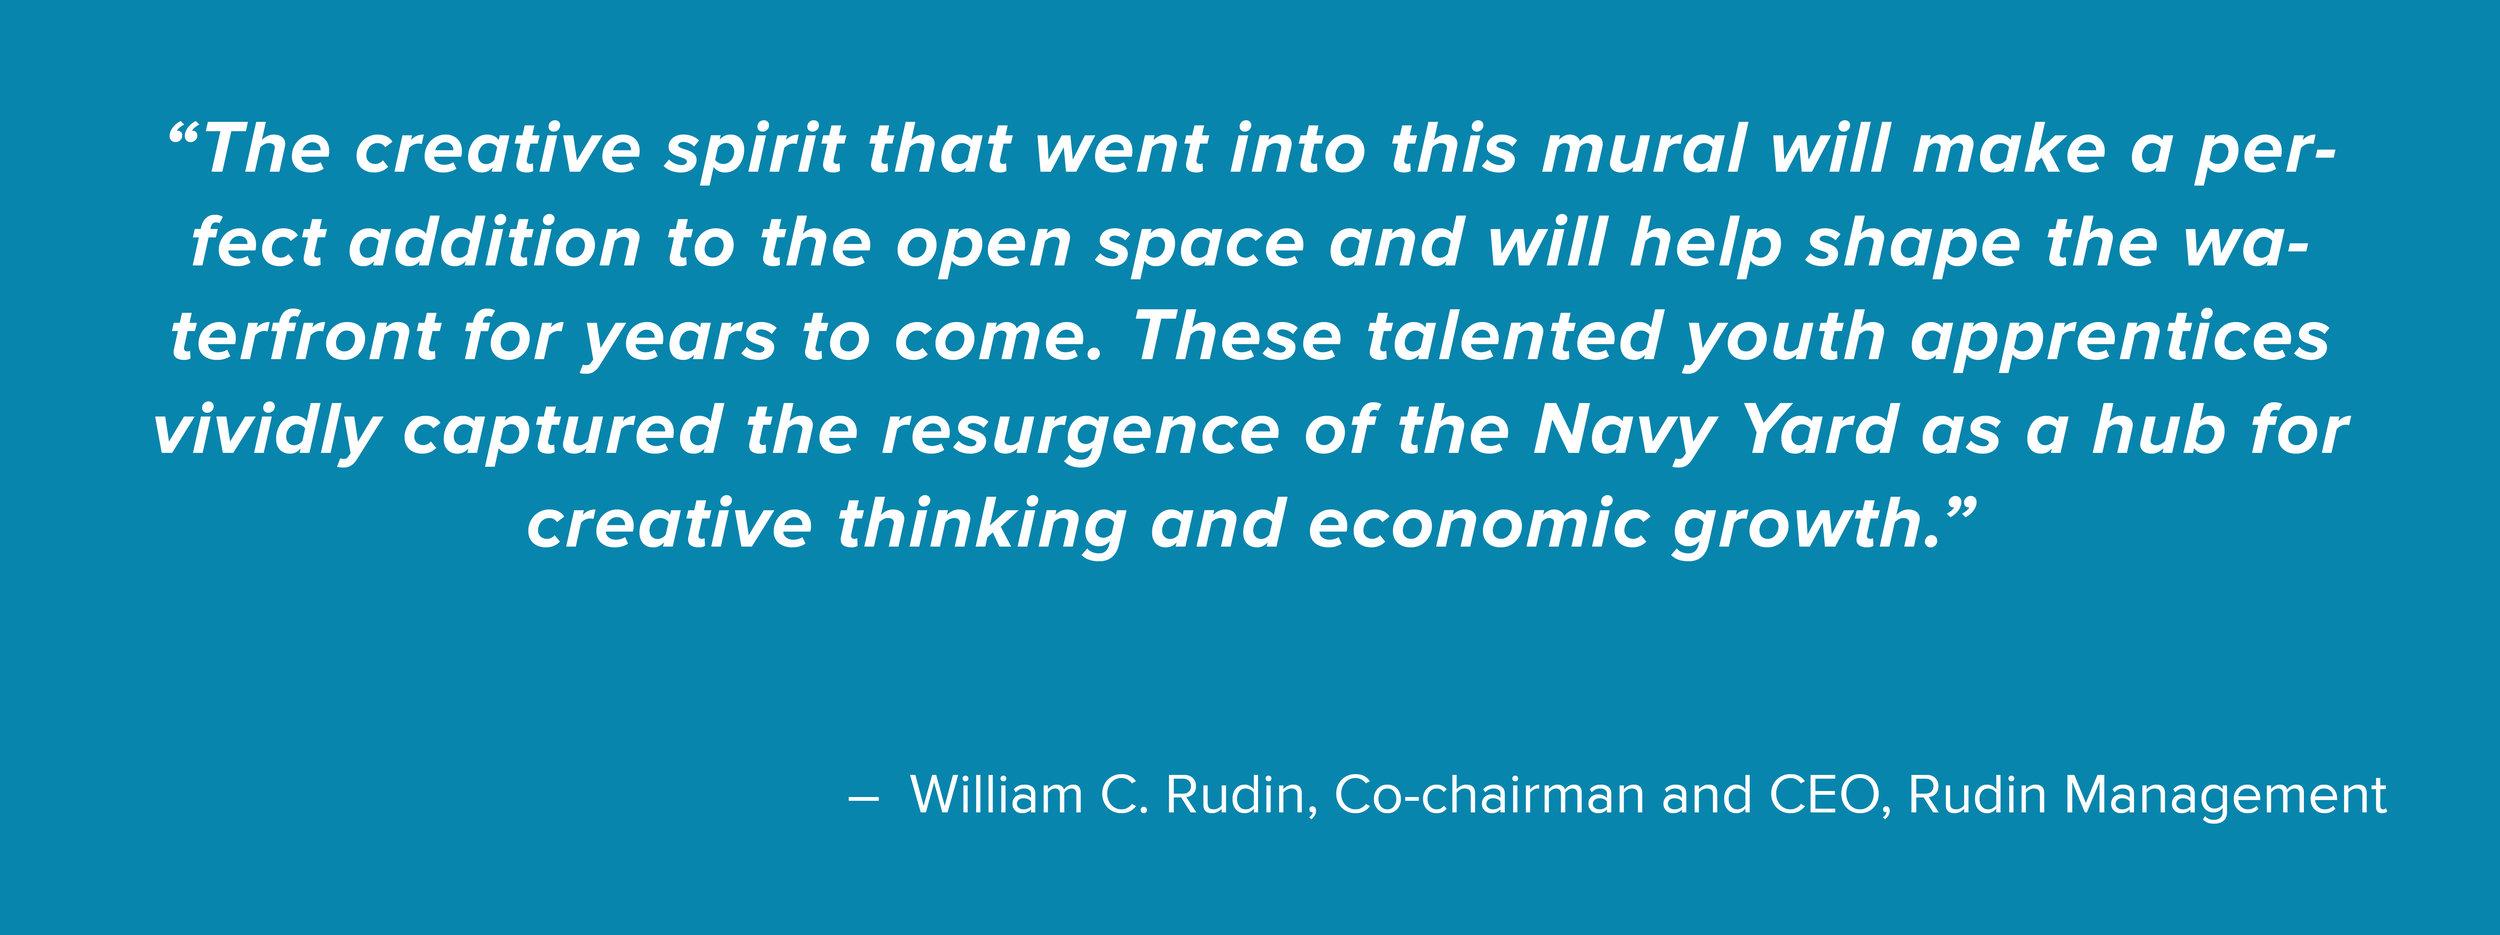 Rudin Quote.jpg